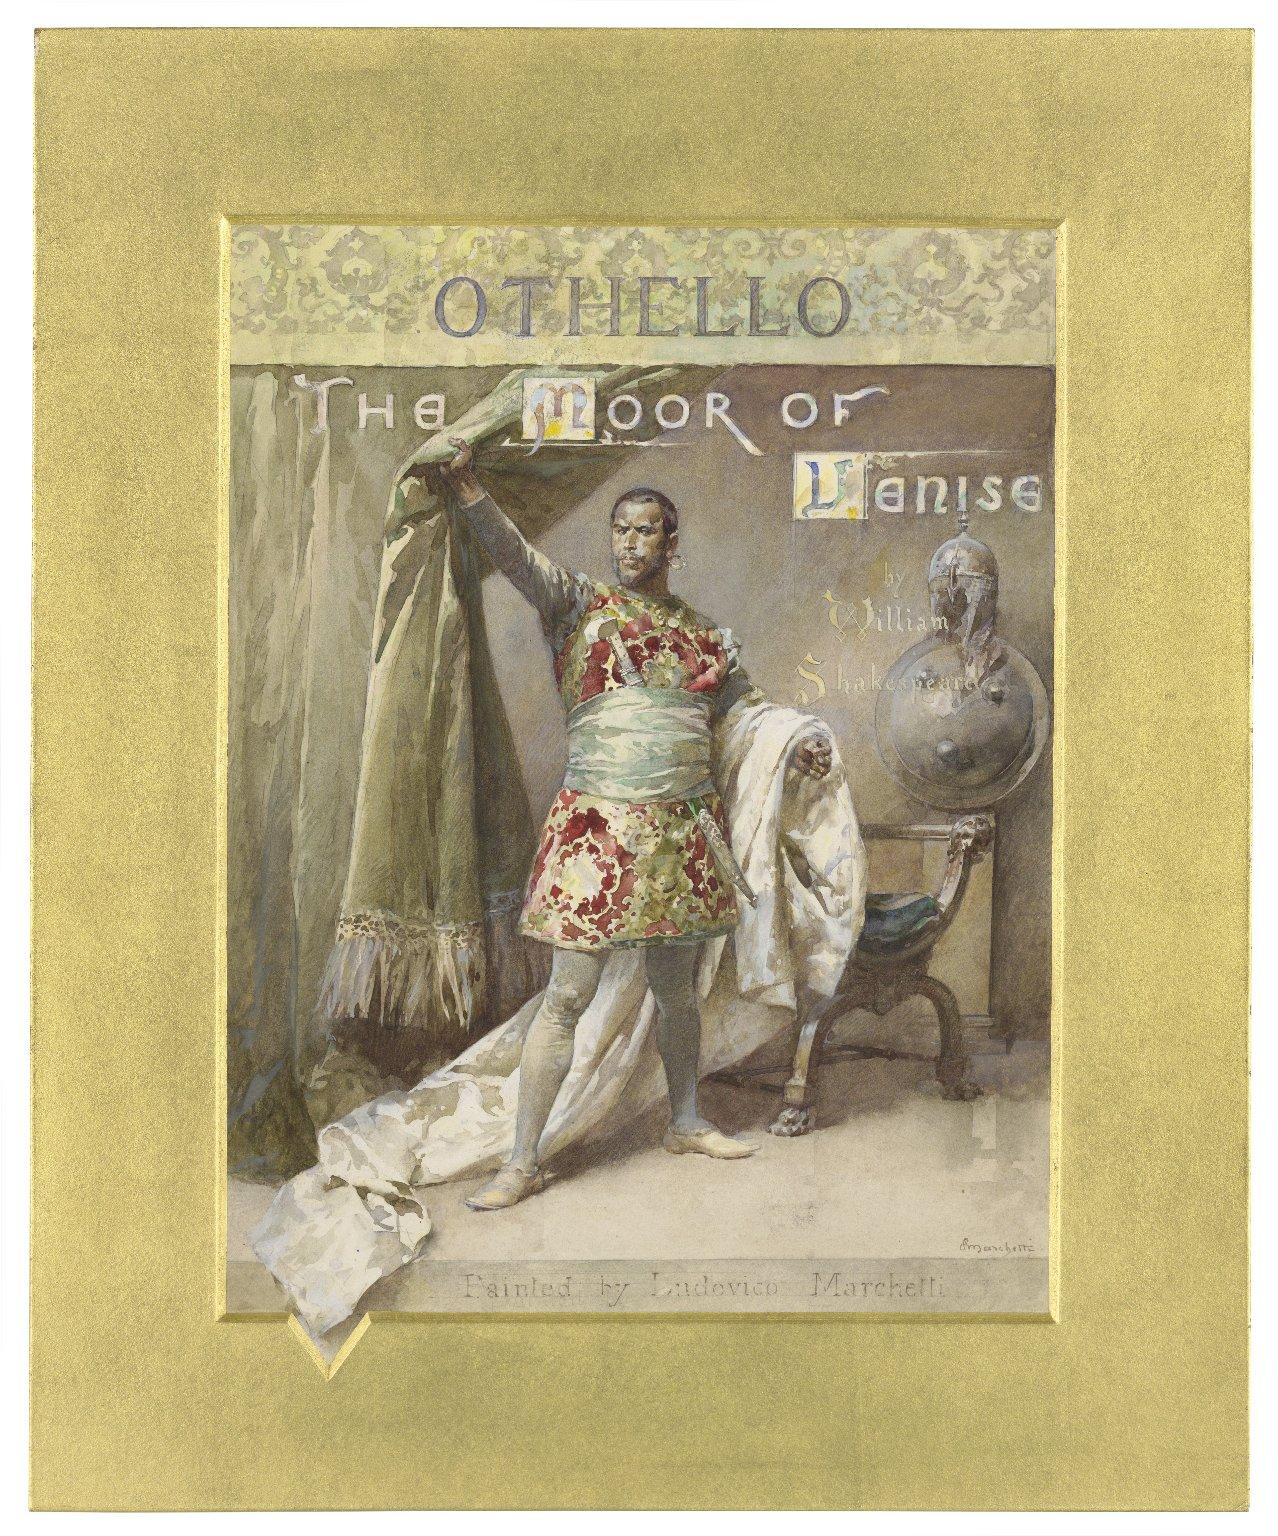 Othello, the Moor of Venise, by William Shakespeare [graphic] / L. Marchetti.